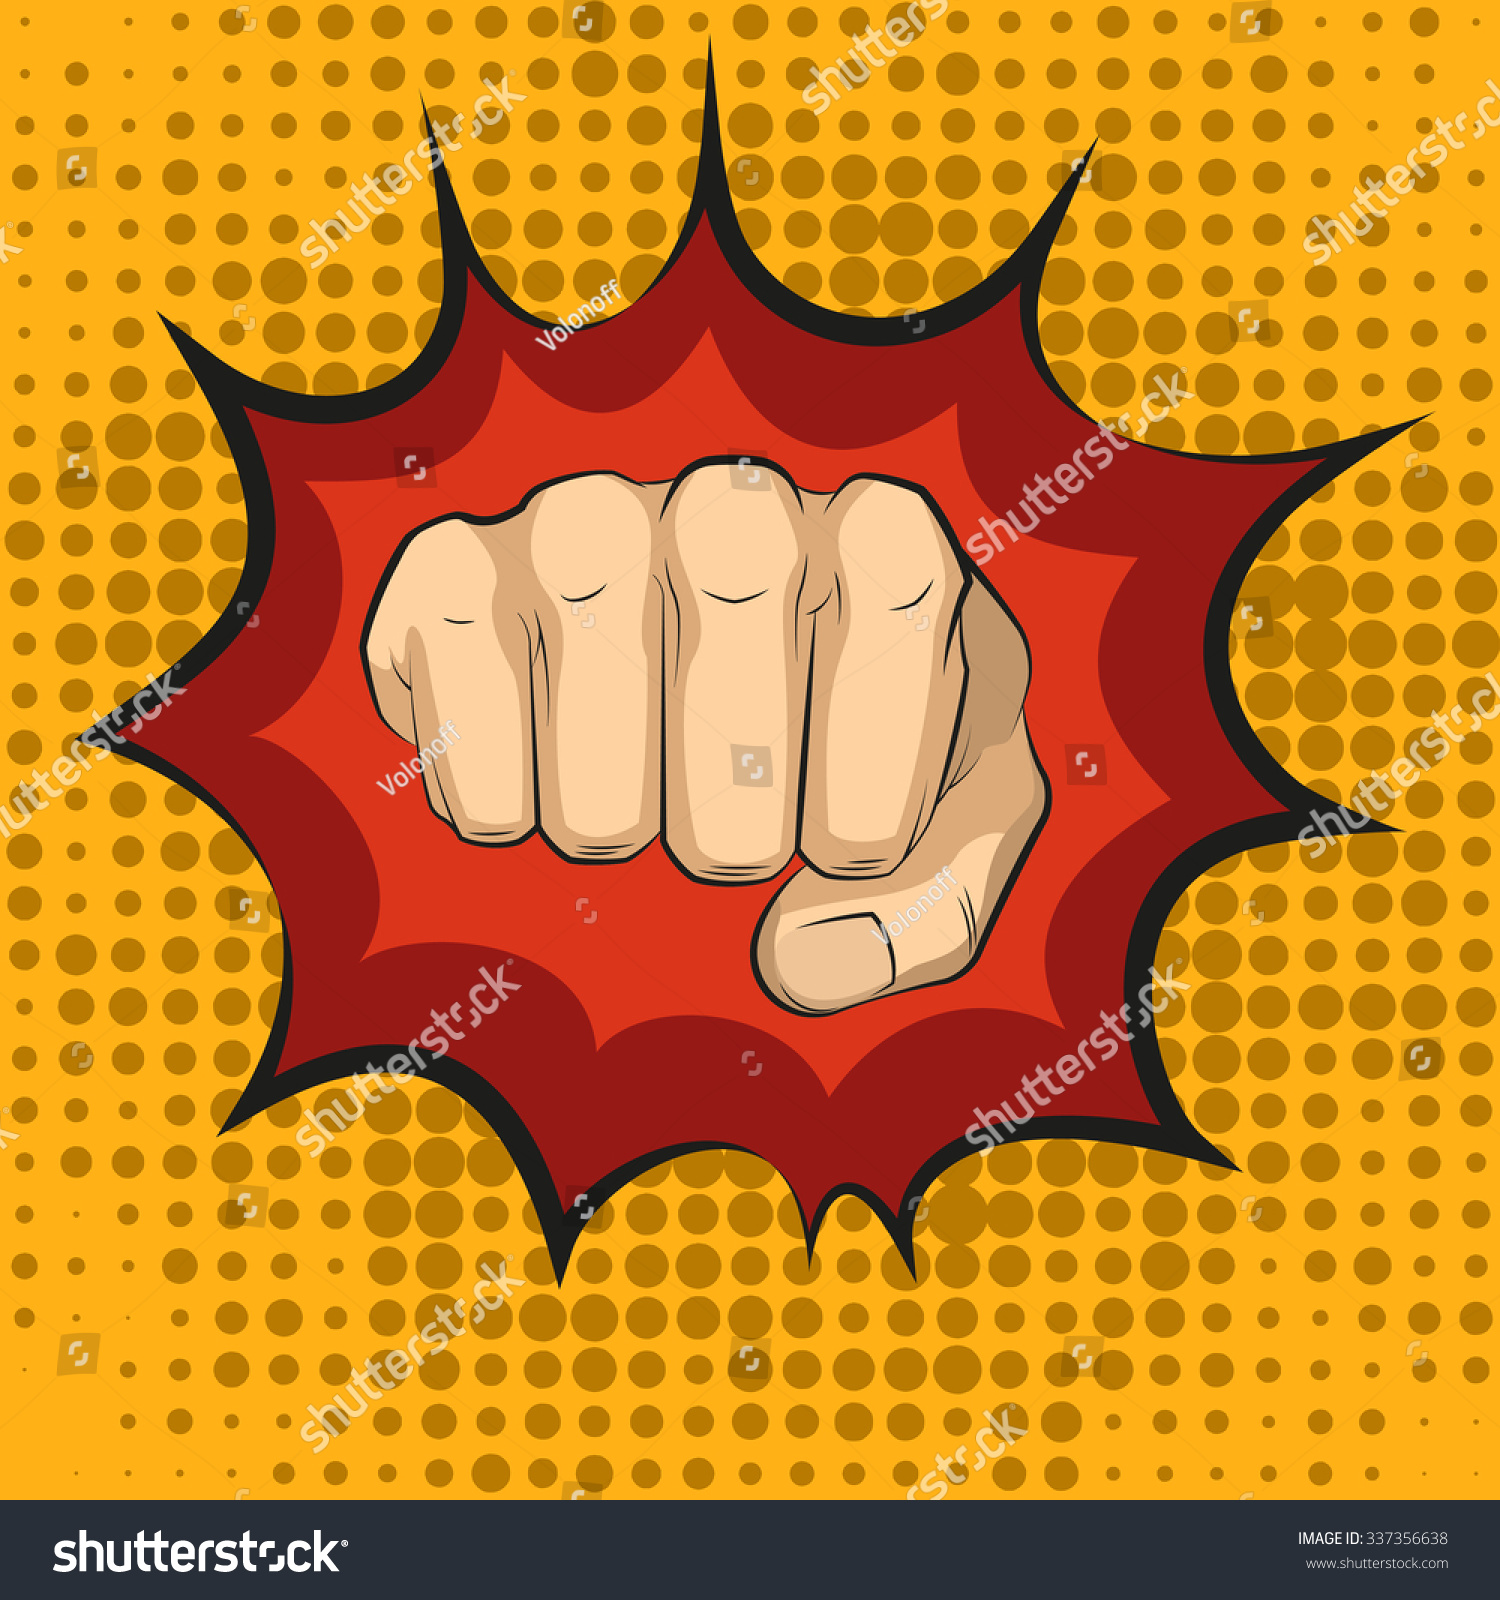 Art of fisting-8820